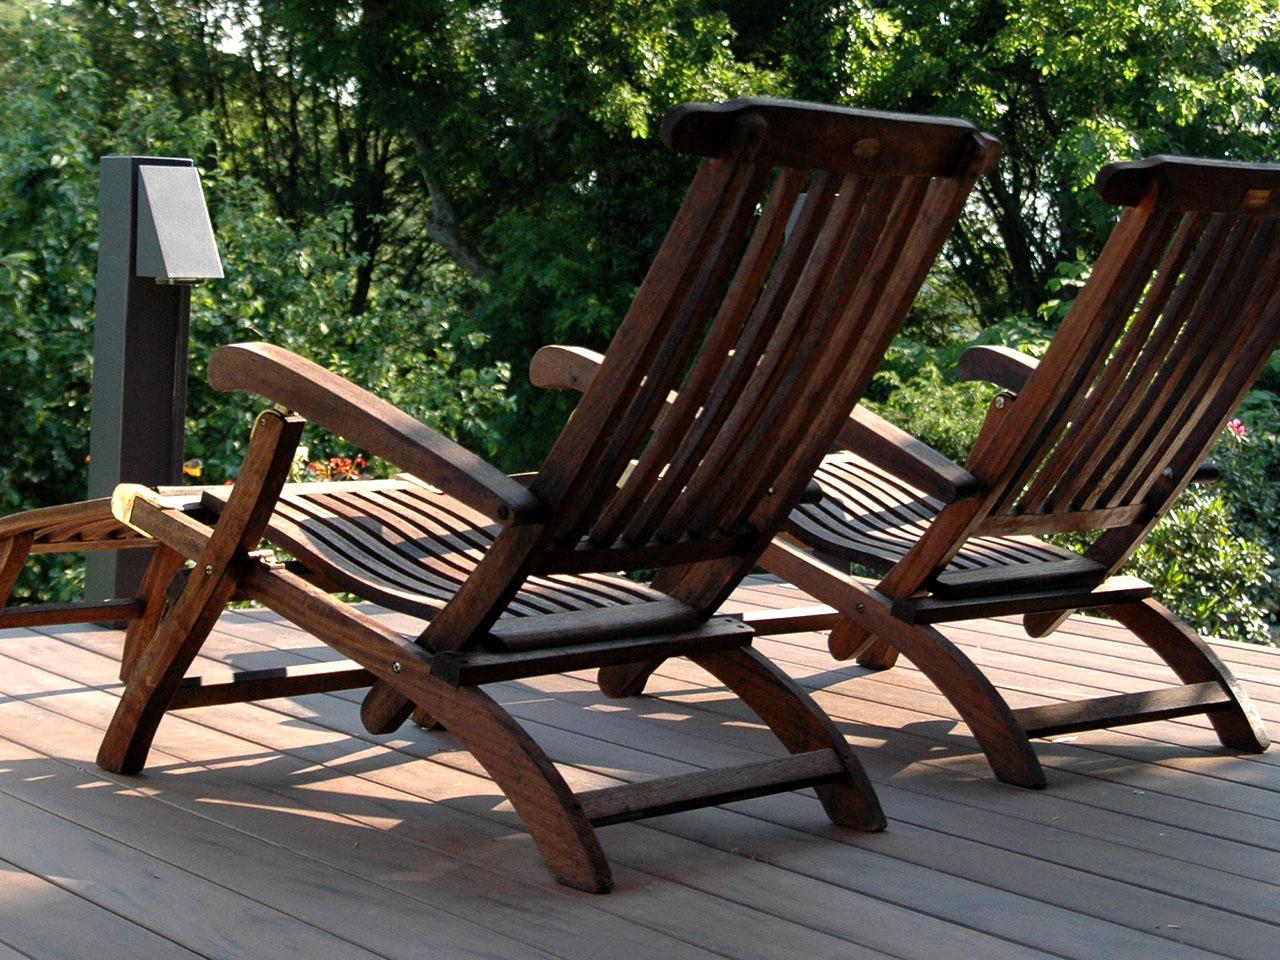 balkongestaltung mediterrane ideen mit mydeck. Black Bedroom Furniture Sets. Home Design Ideas